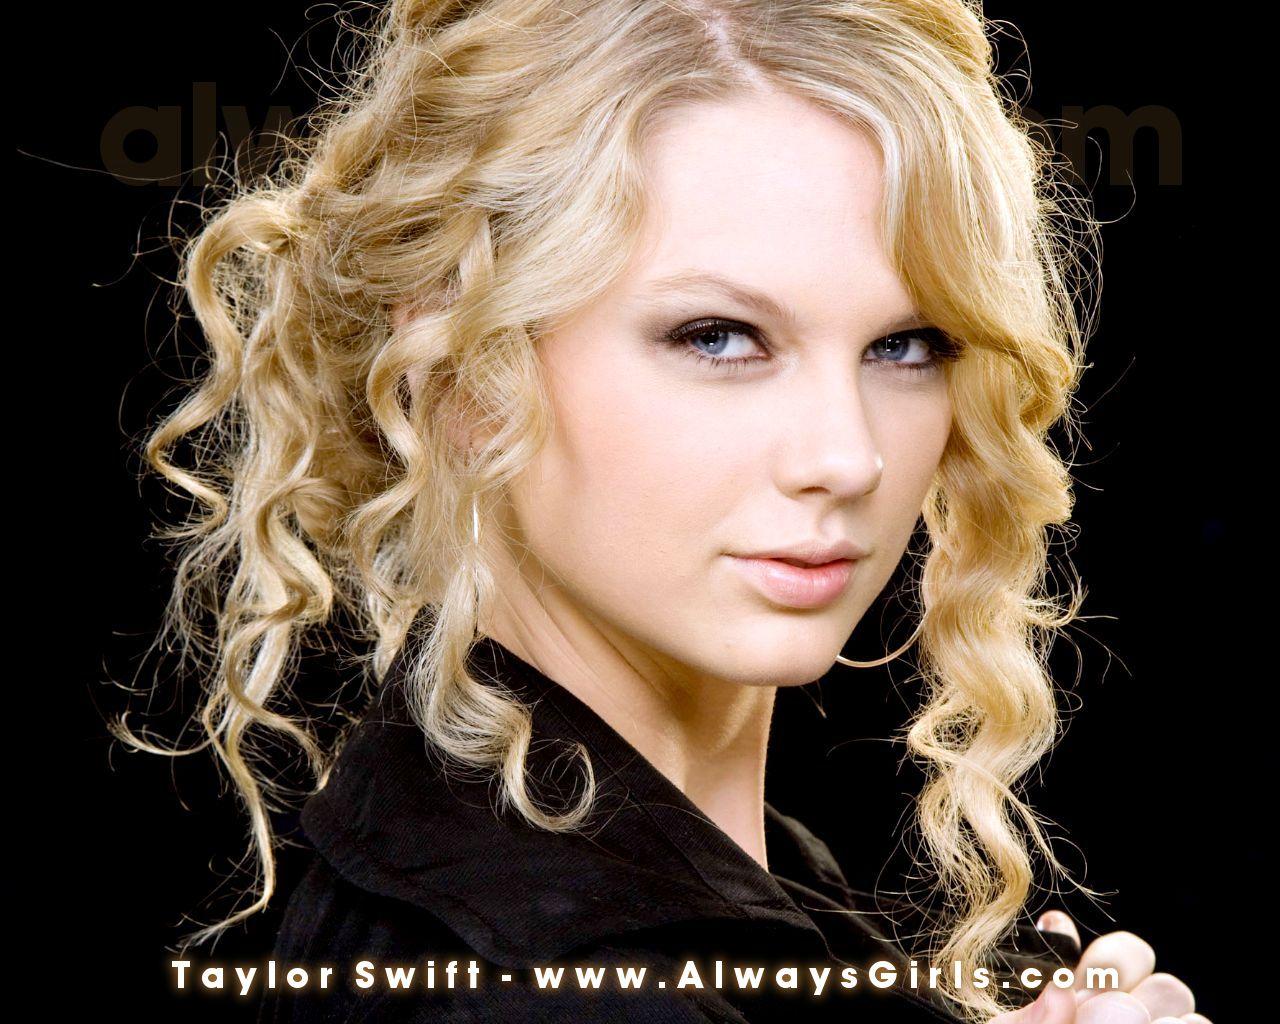 http://4.bp.blogspot.com/-TJlf0HuBy_A/TpfrIl391pI/AAAAAAAAARA/-MEGI--o9Cc/s1600/taylor_swift-01.jpg